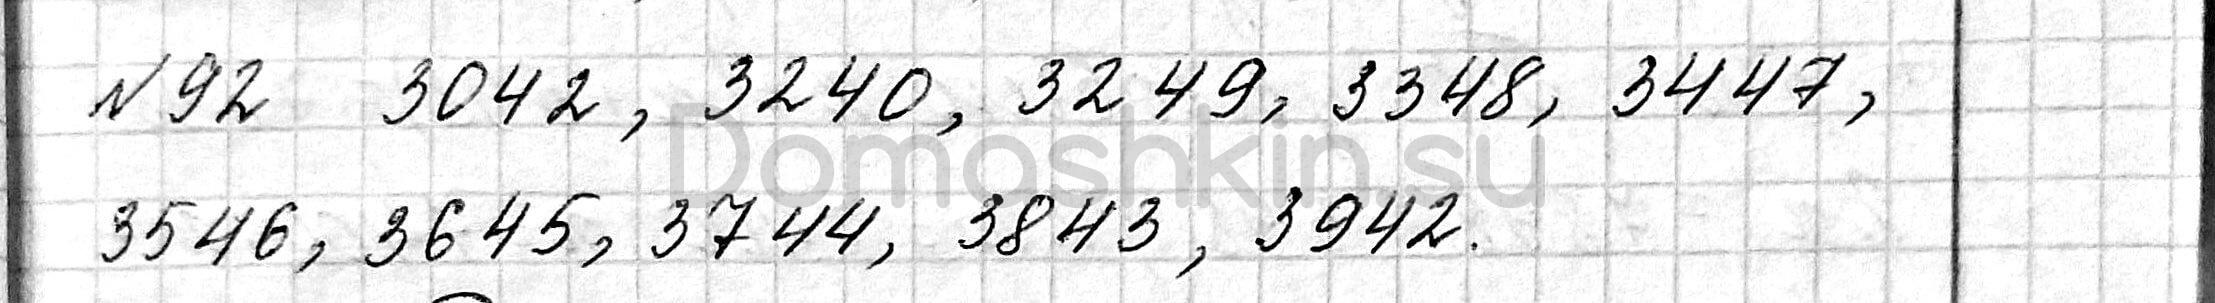 Математика 6 класс учебник Мерзляк номер 92 решение